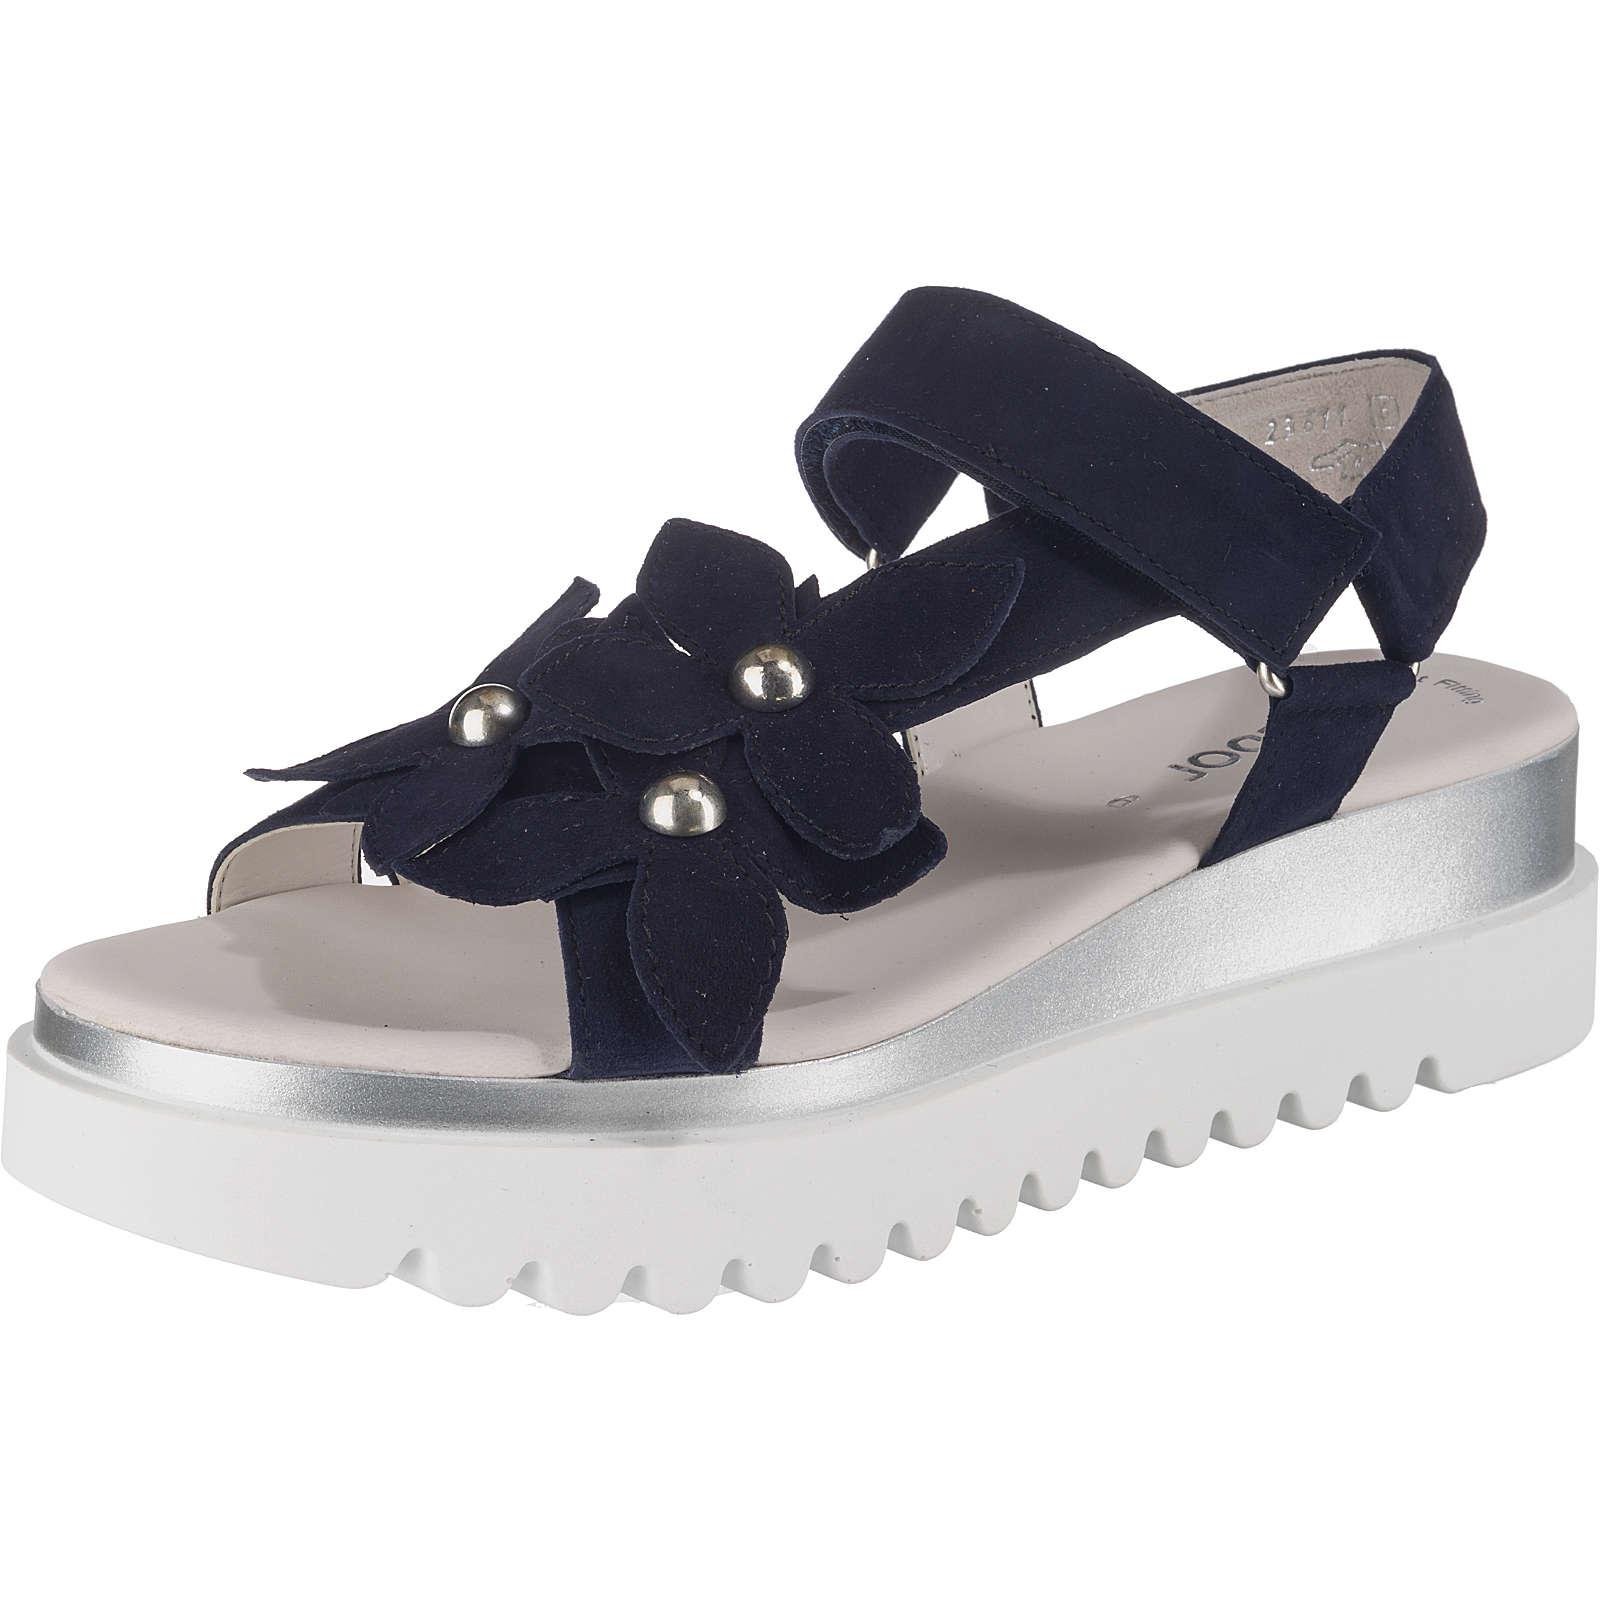 Gabor Klassische Sandalen blau Damen Gr. 37,5